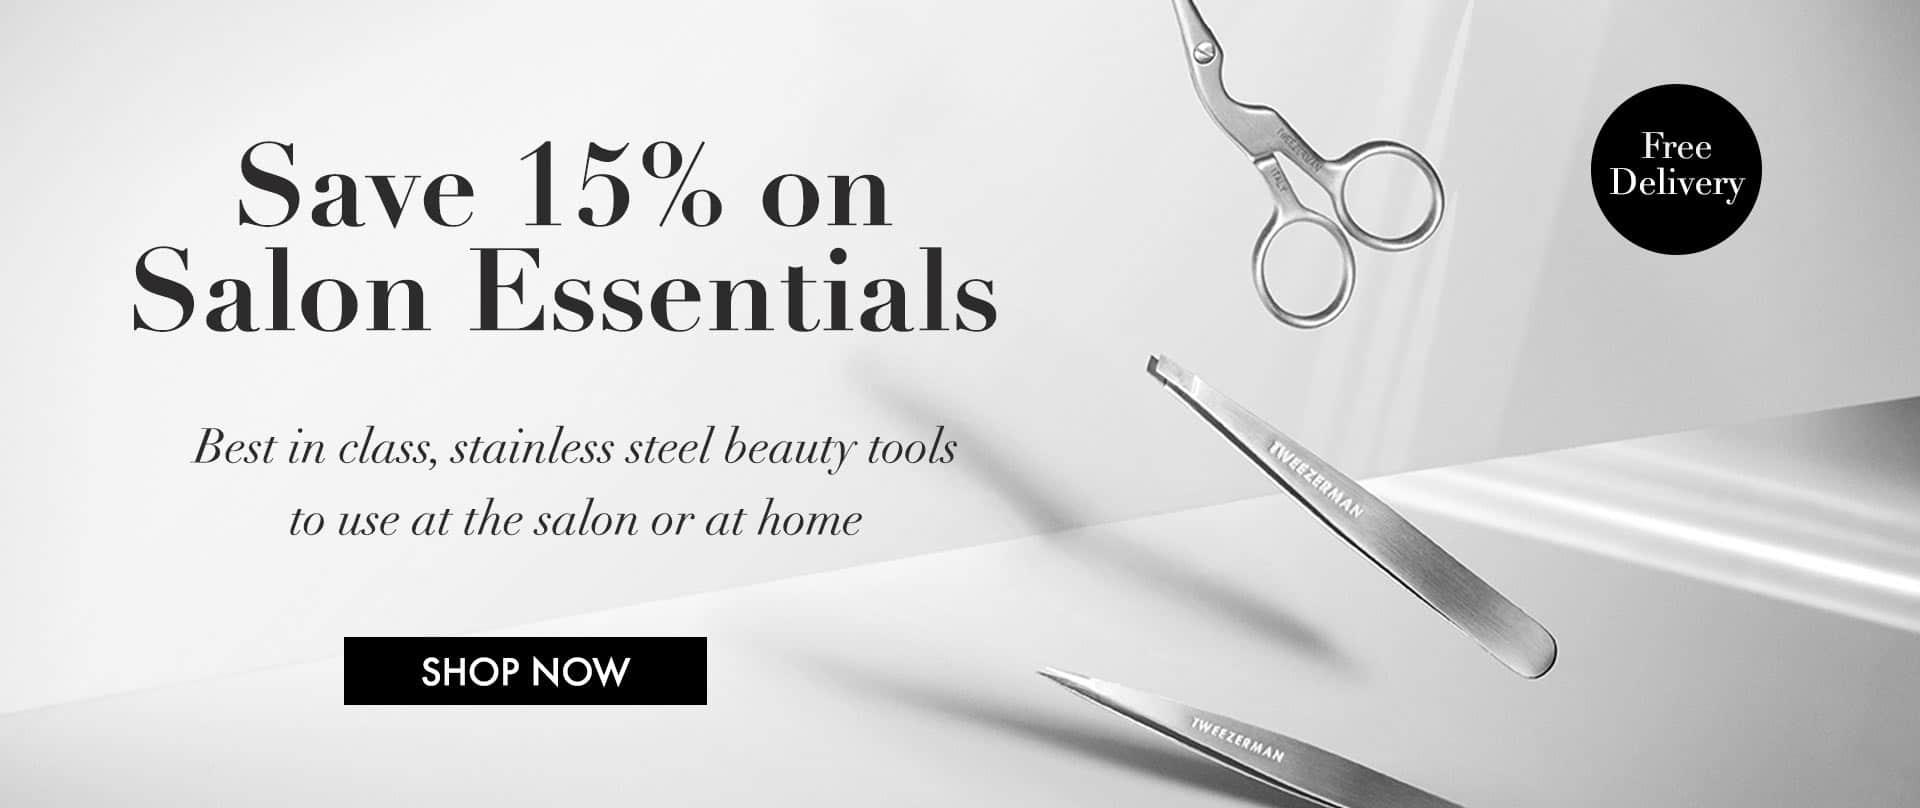 Salon Essentials | Tweezerman UK